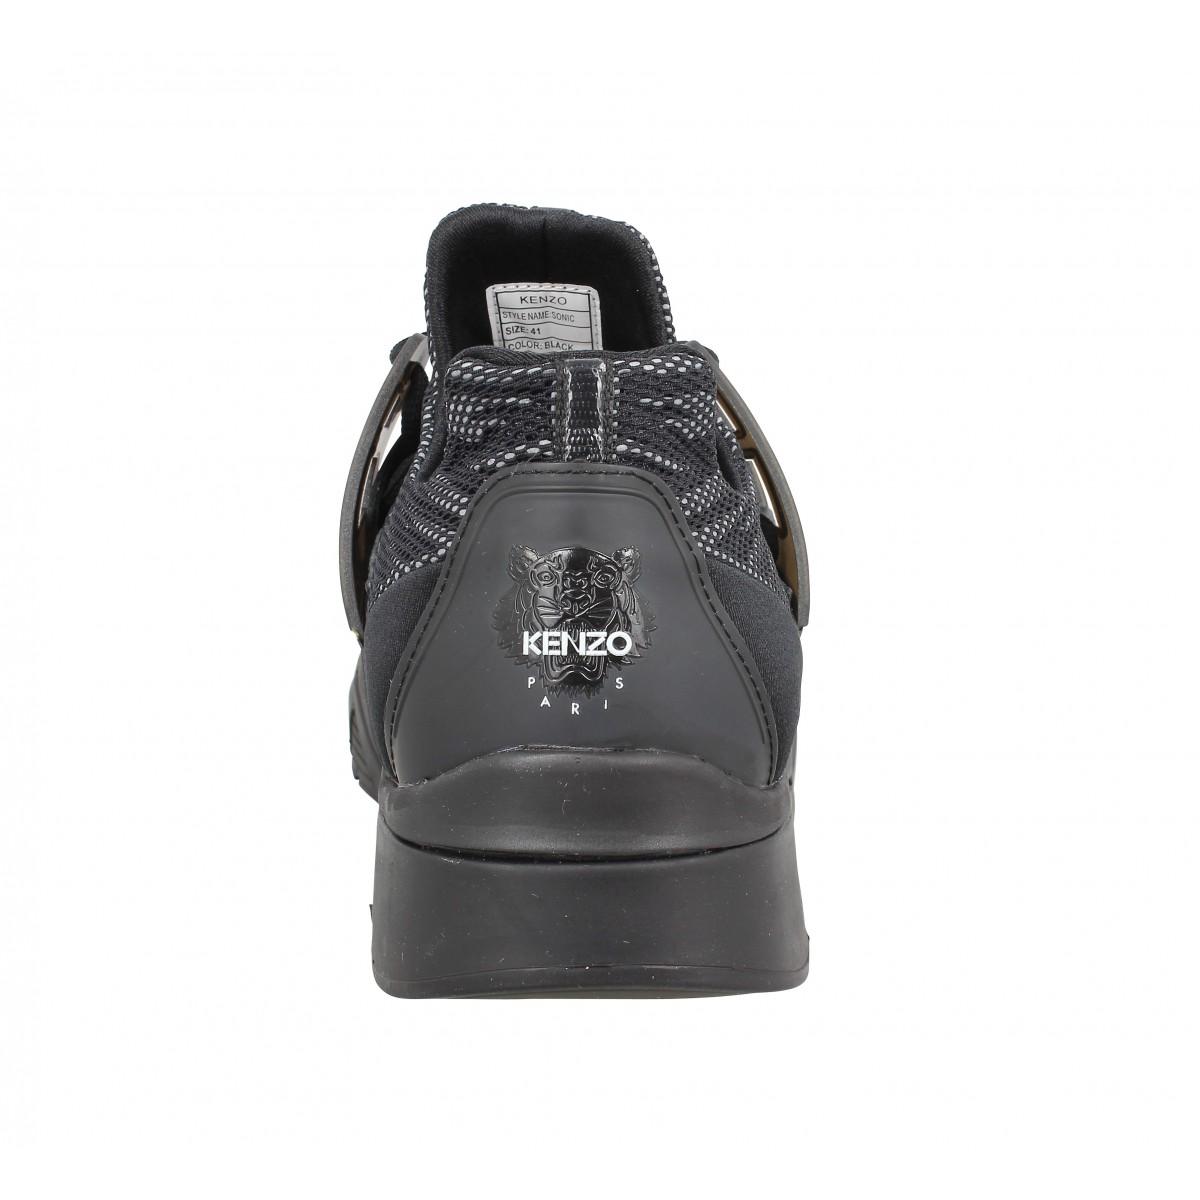 Kenzo Sonic Noir Homme Fanny Chaussures Tzxcfert-120602-5500771 Yet Not Vulgar Pour Promot